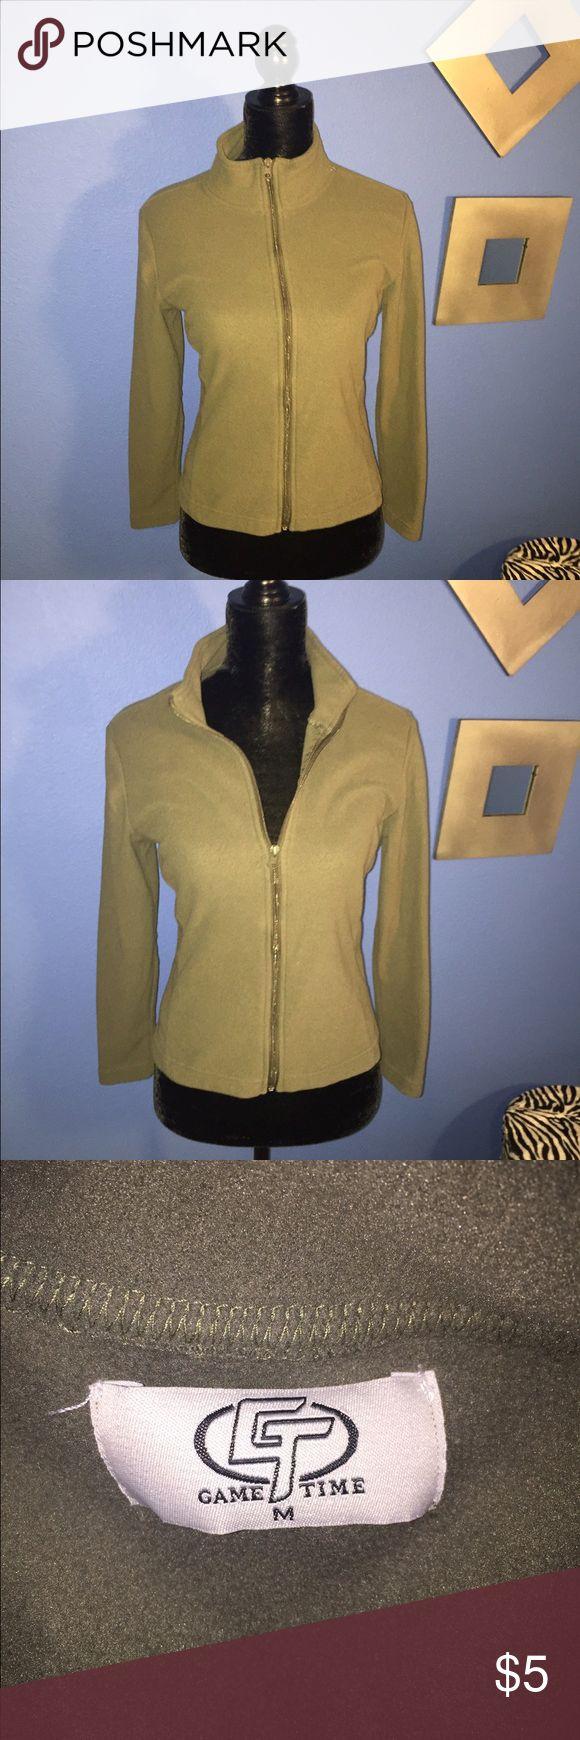 Green zip up fleece. Super soft green zip up fleece. Size M but fits like an XS Tops Sweatshirts & Hoodies